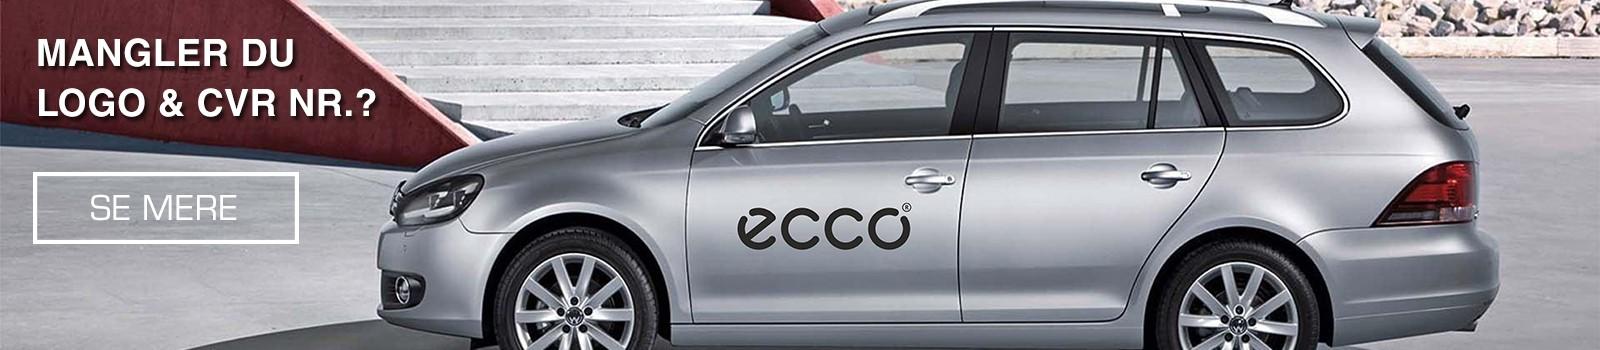 Logo på bil